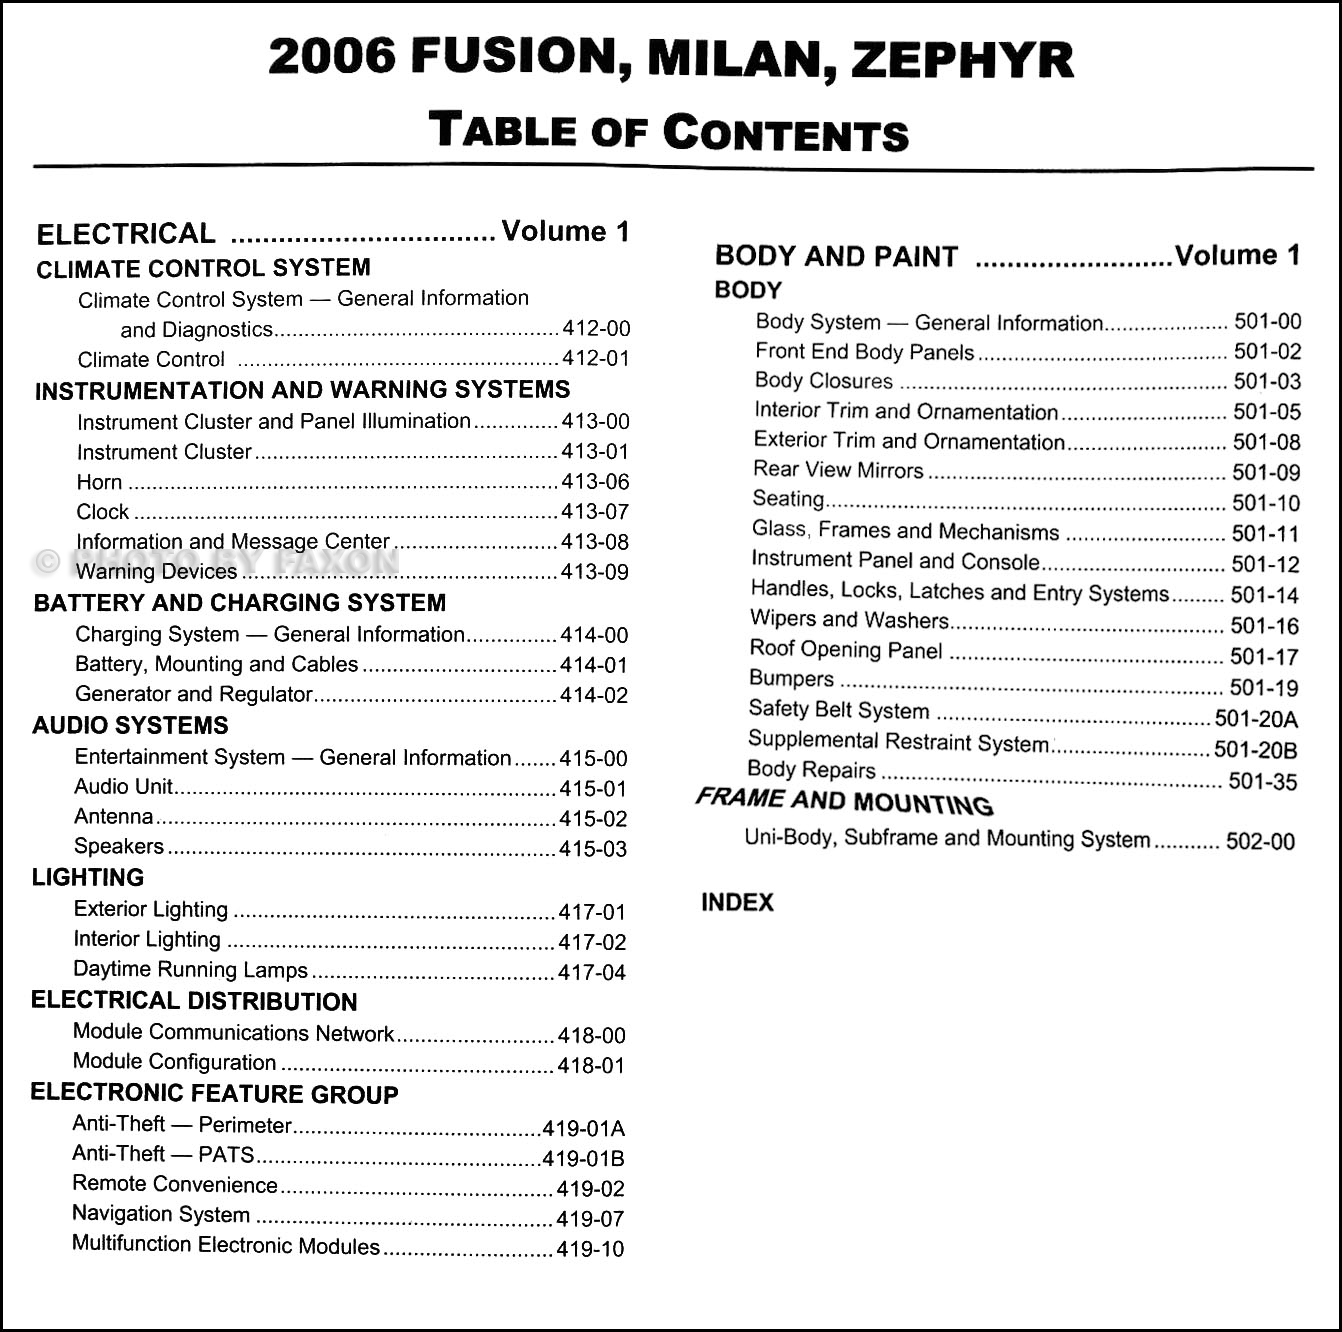 Wiring Diagram Ford Fusion 2009 Great Design Of 2010 Engine Mini Cooper S 2002 Explorer